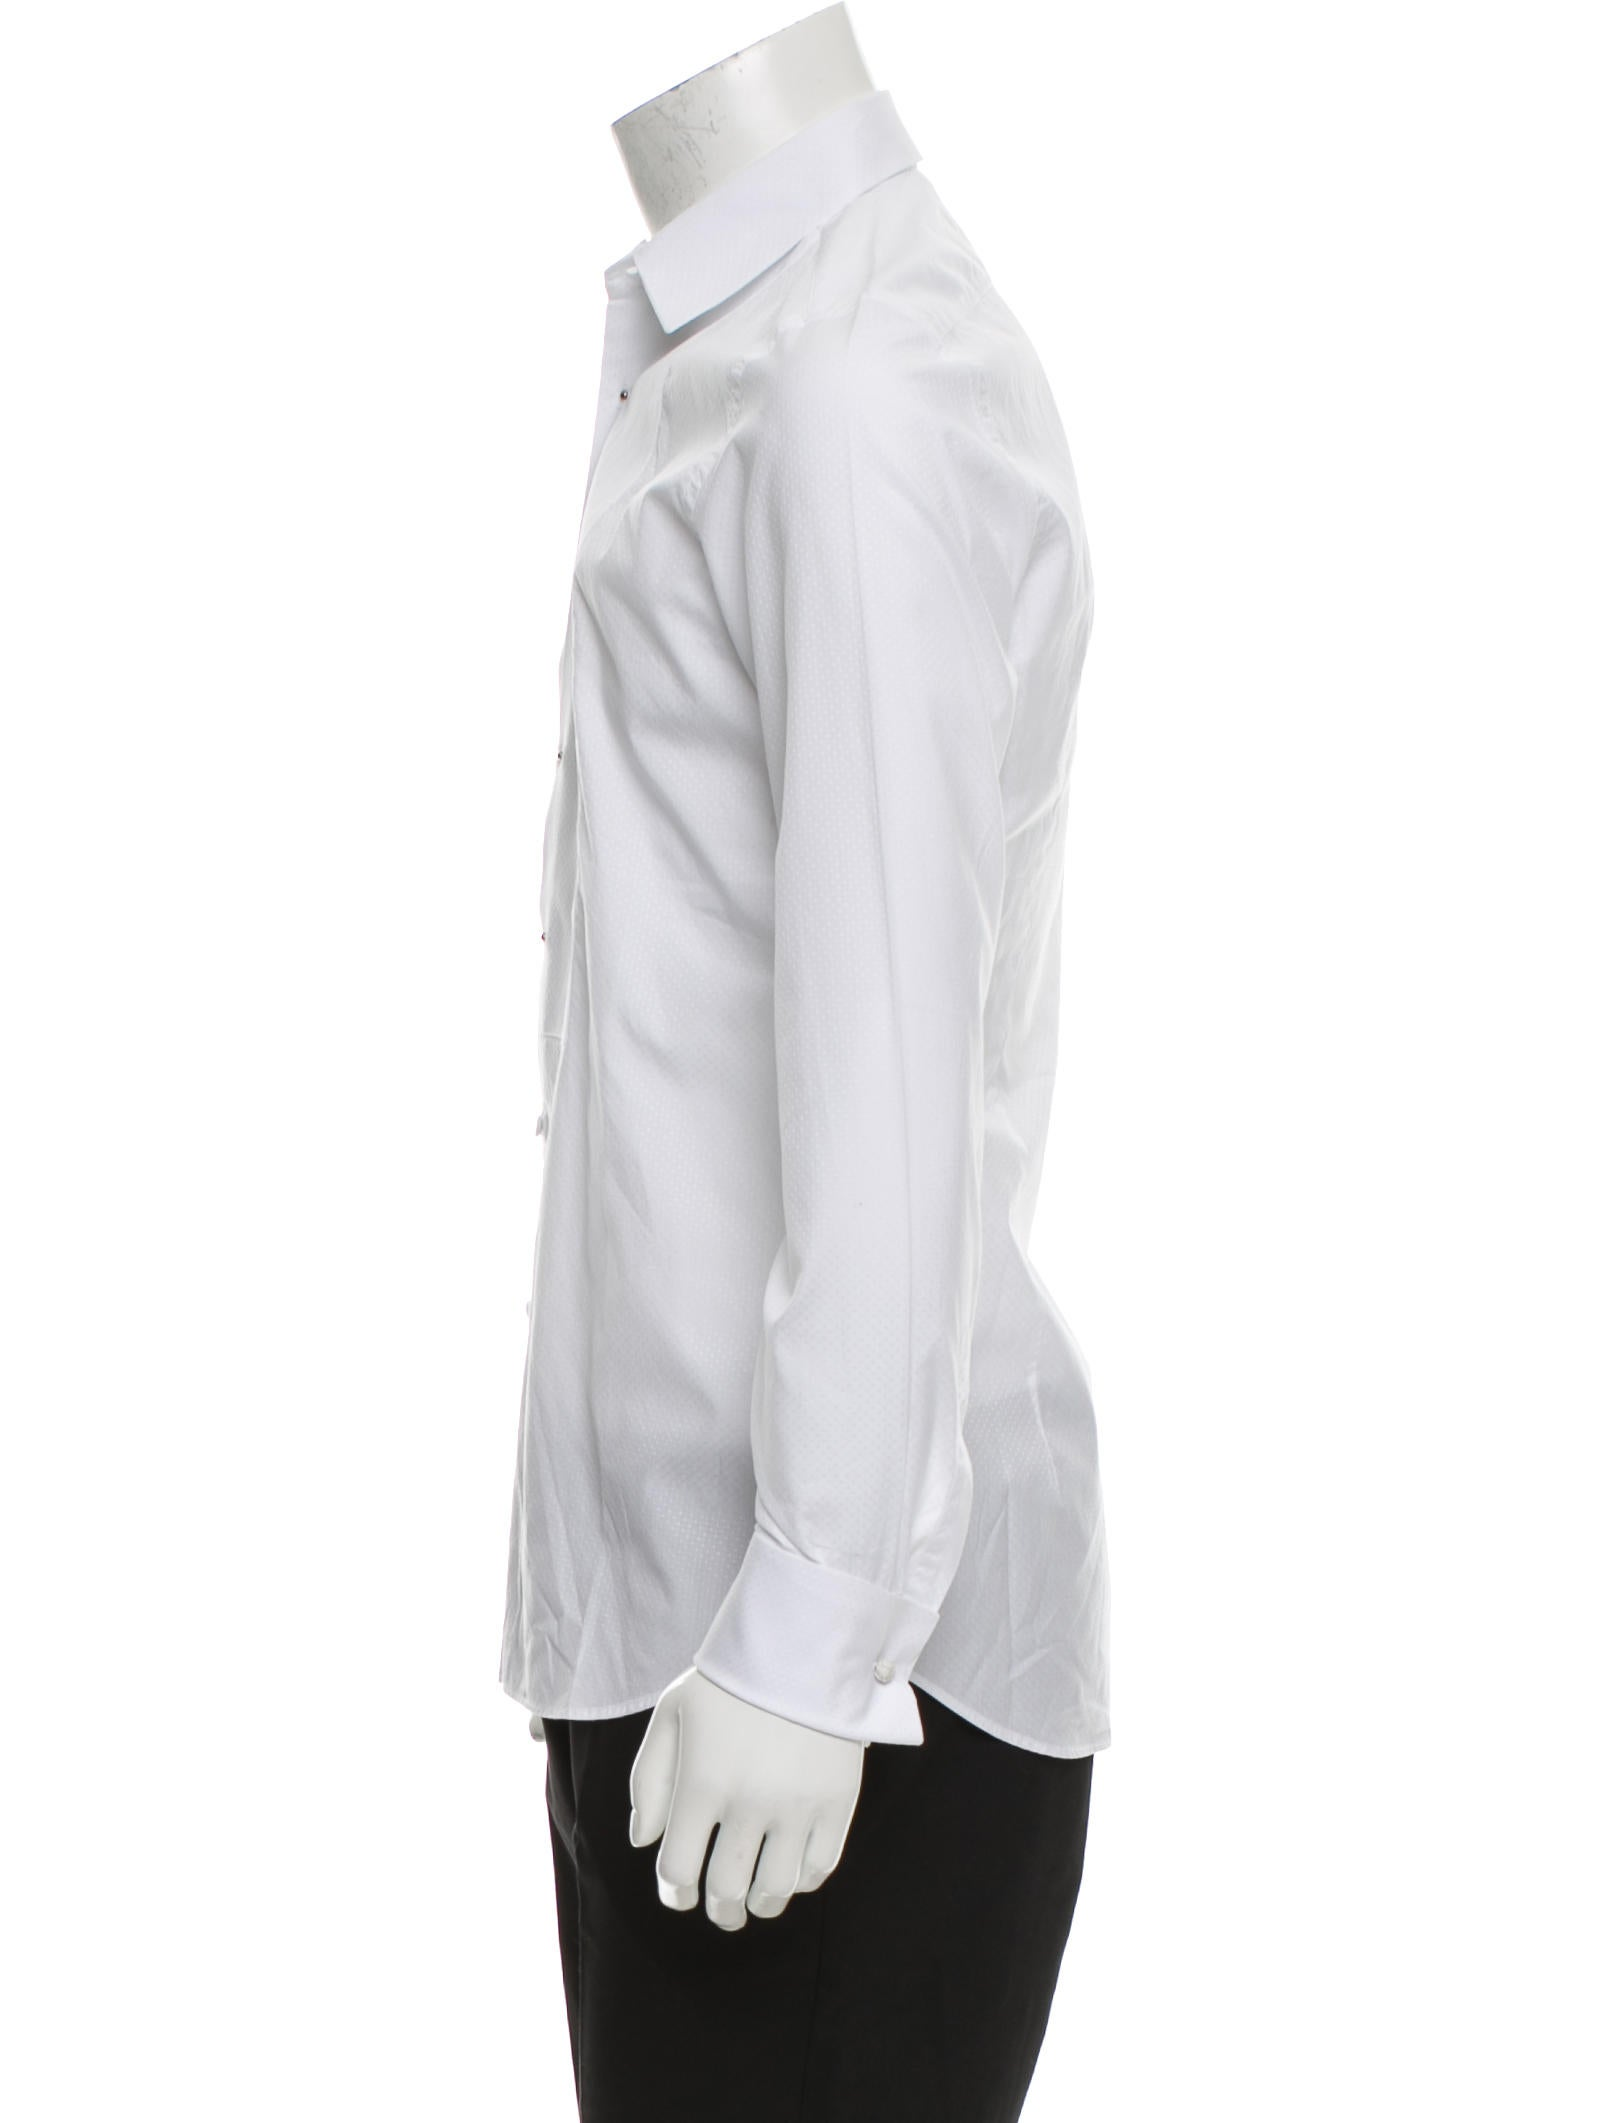 Prada tuxedo french cuff shirt clothing pra153980 for Tuxedo shirt french cuff